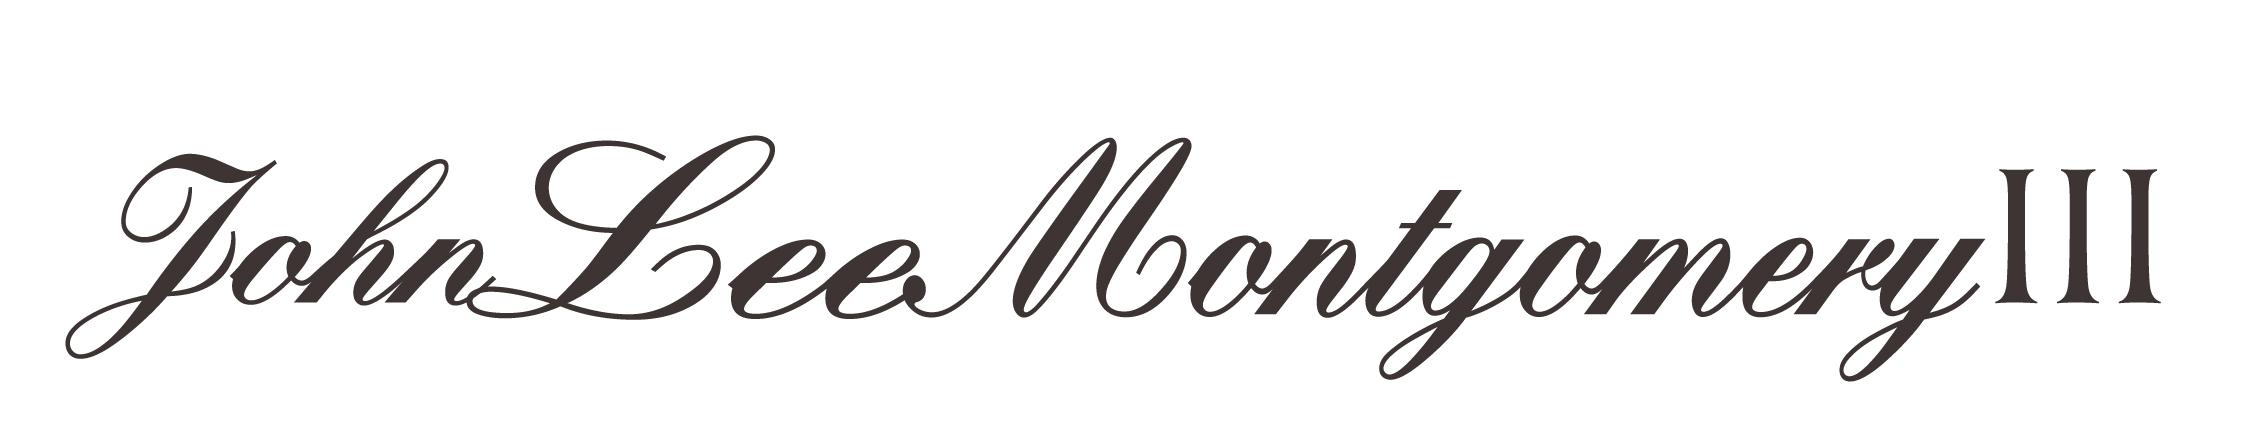 John Lee Montgomery III's Signature